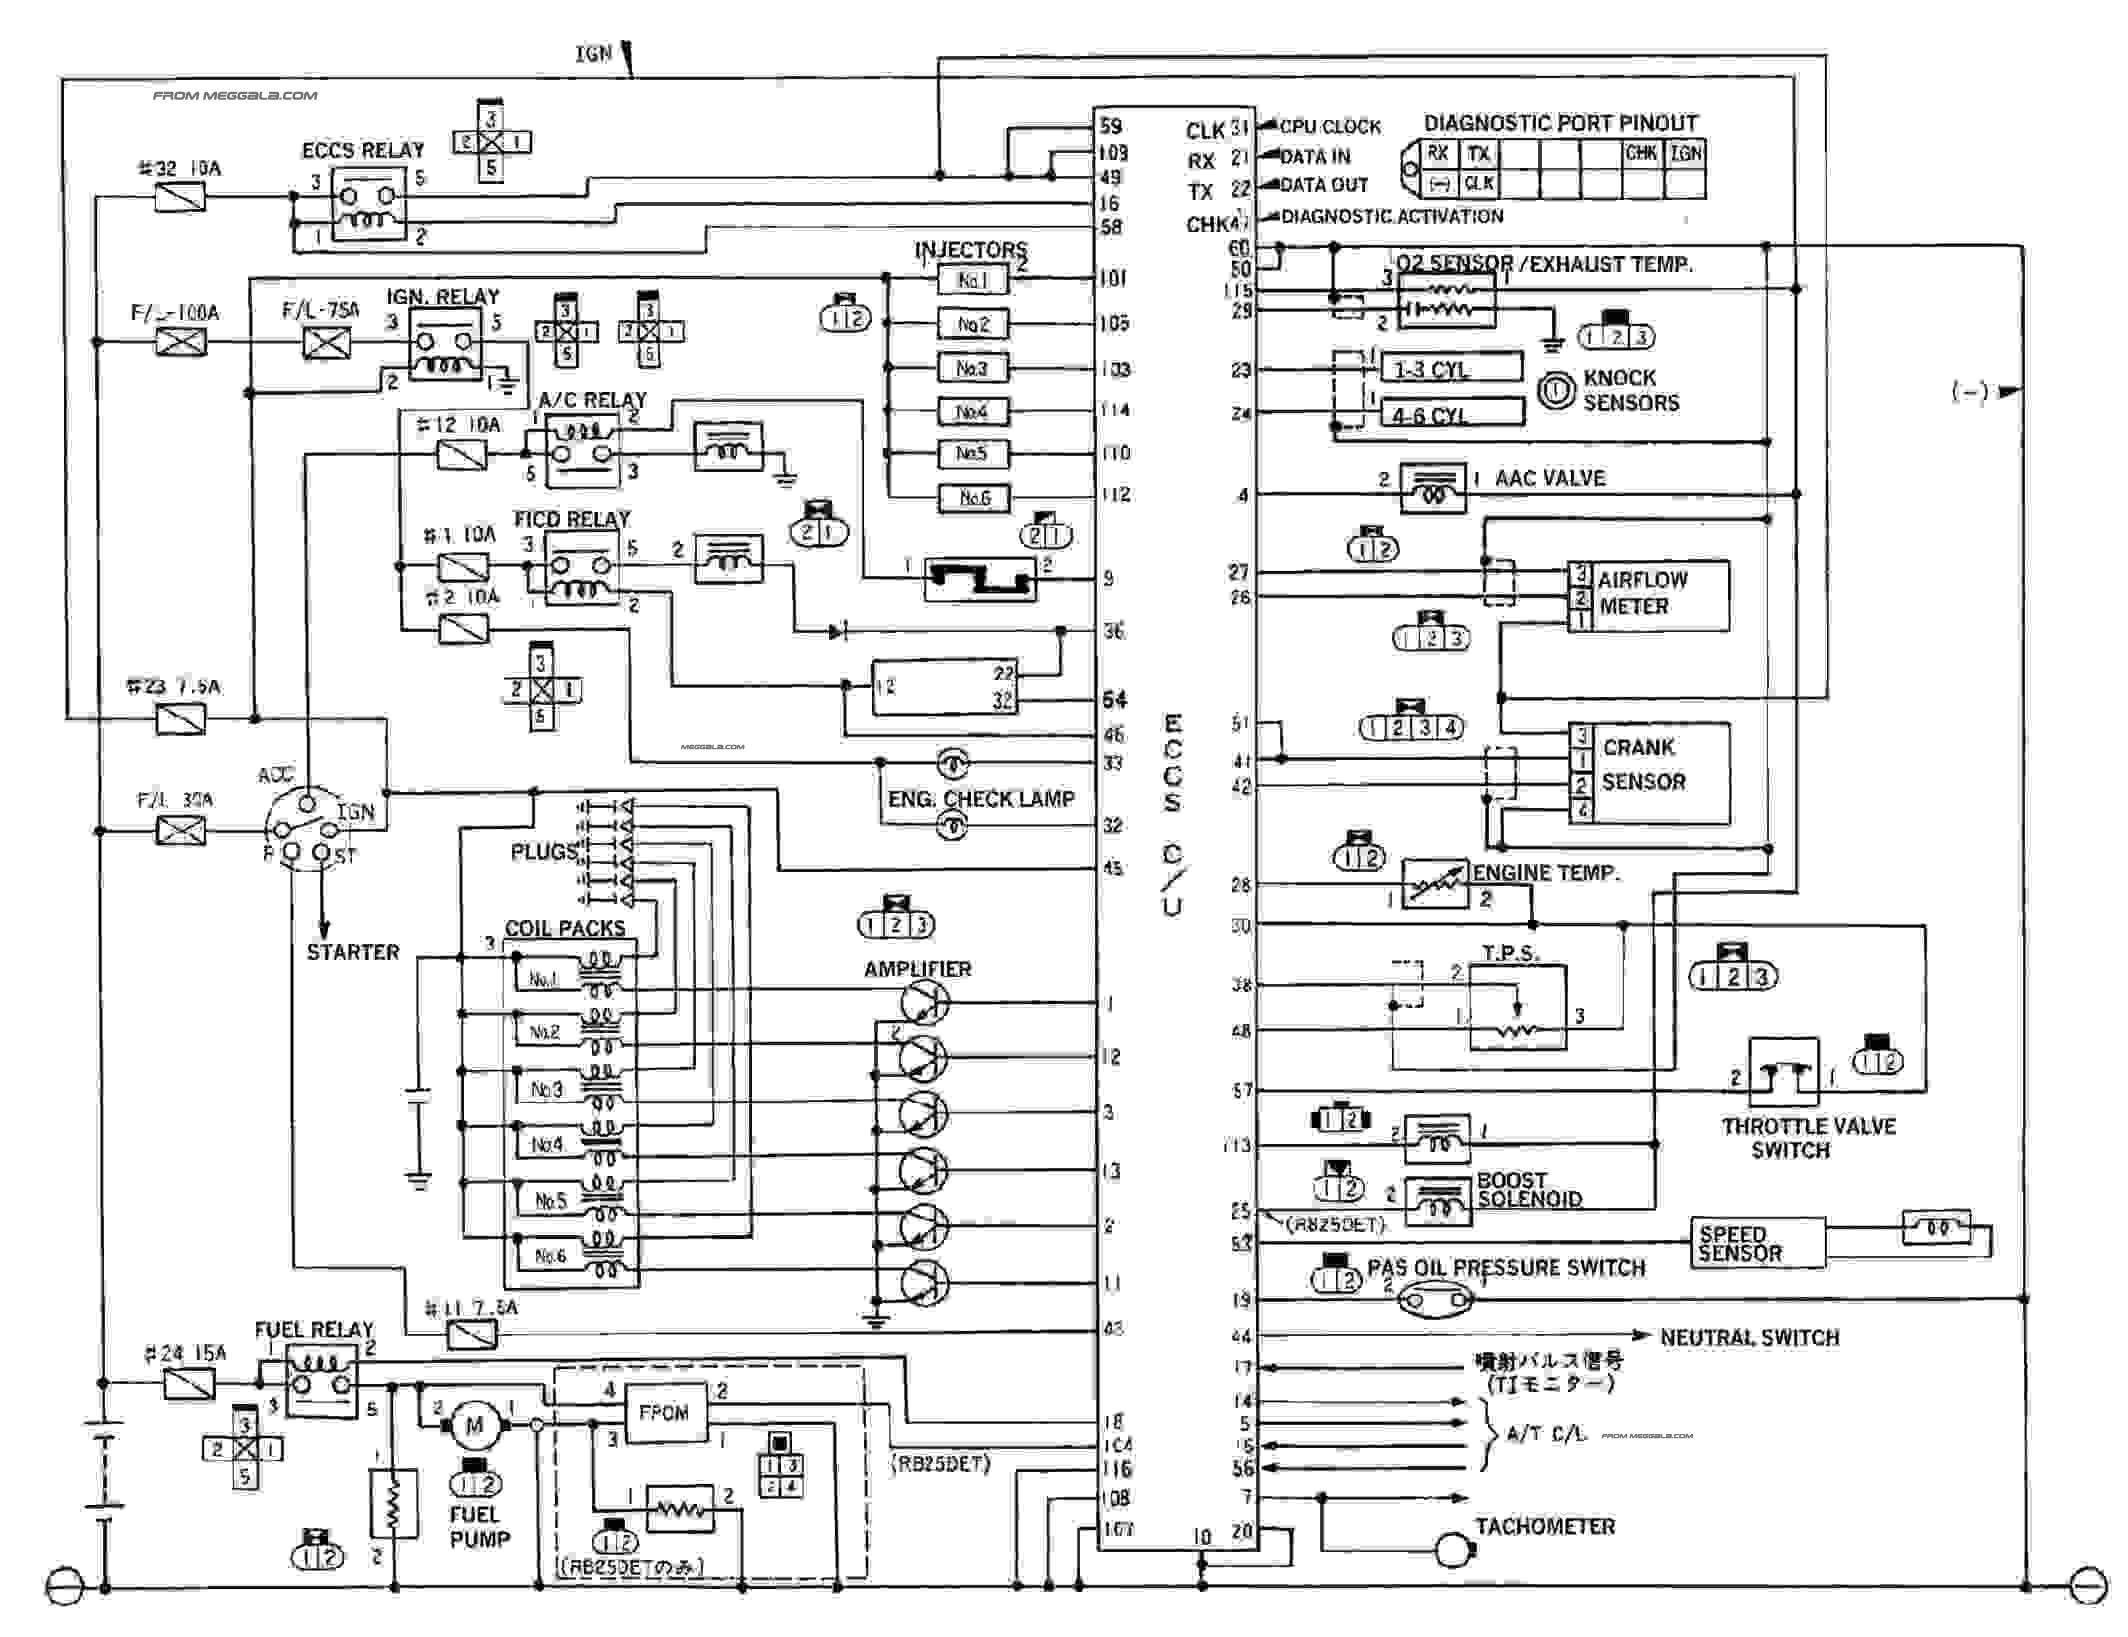 r32 engine diagram wiring diagram centre rb20det engine loom diagram rb20det engine diagram